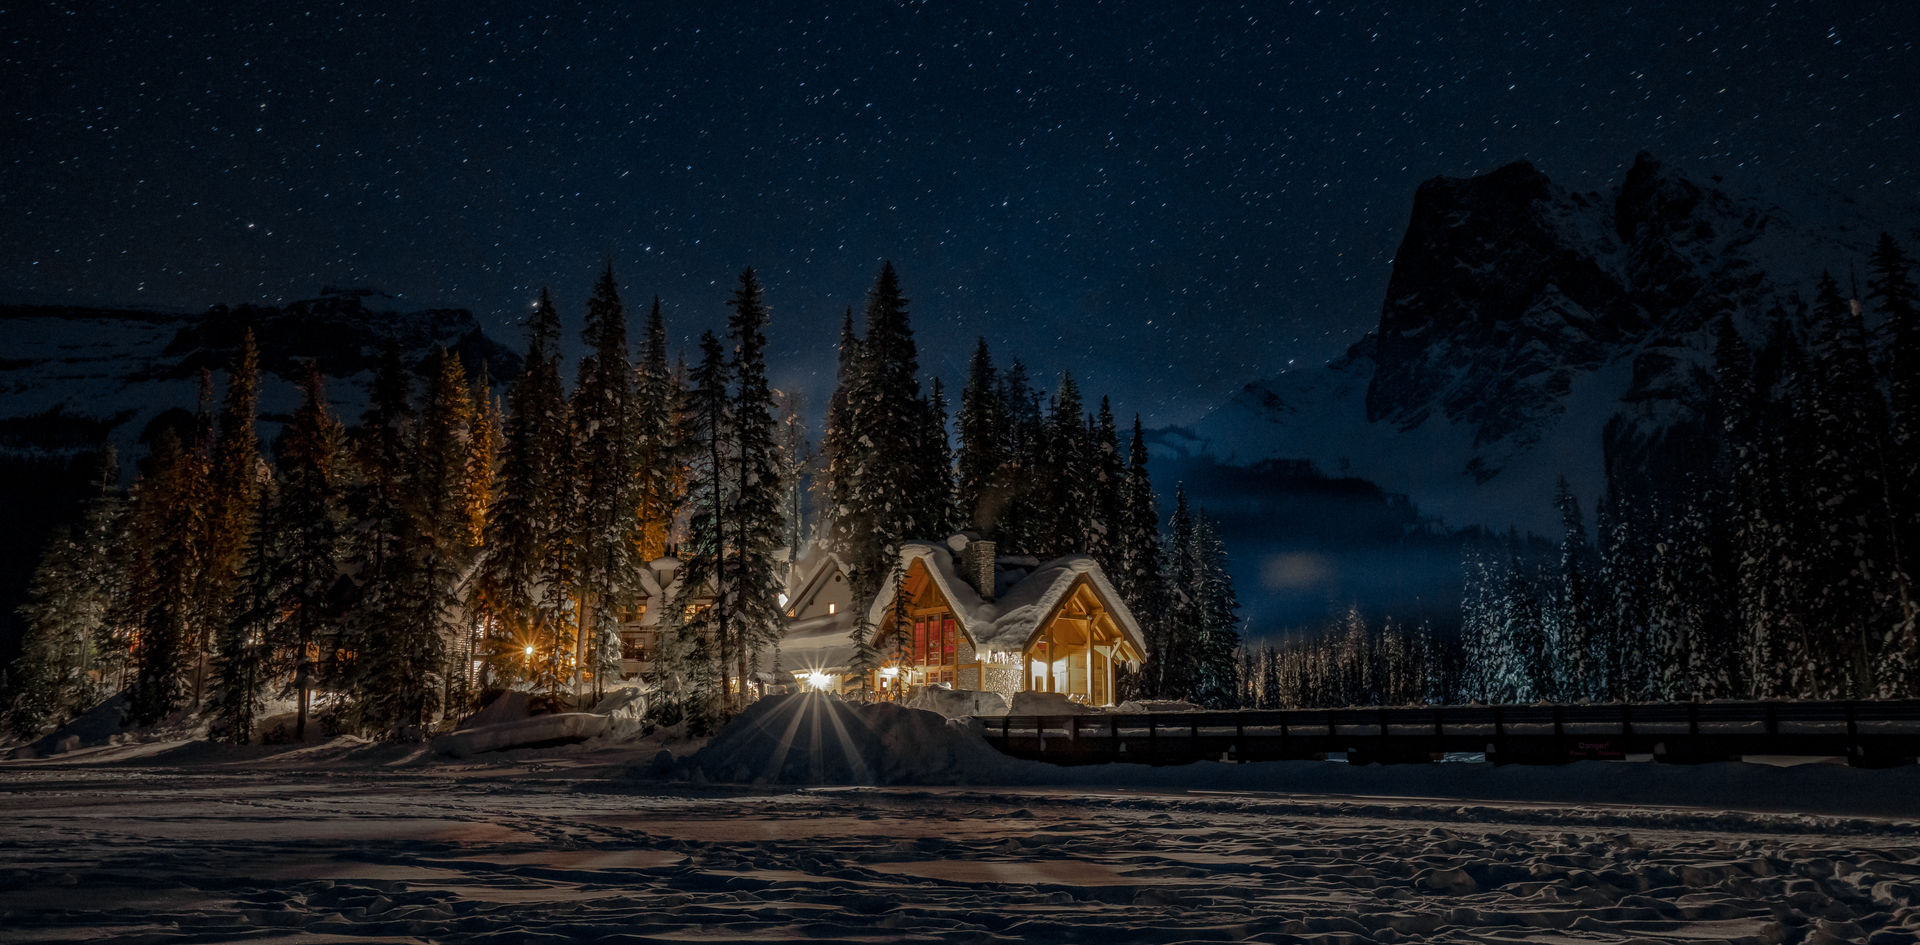 Nighttime at Emerald Lake